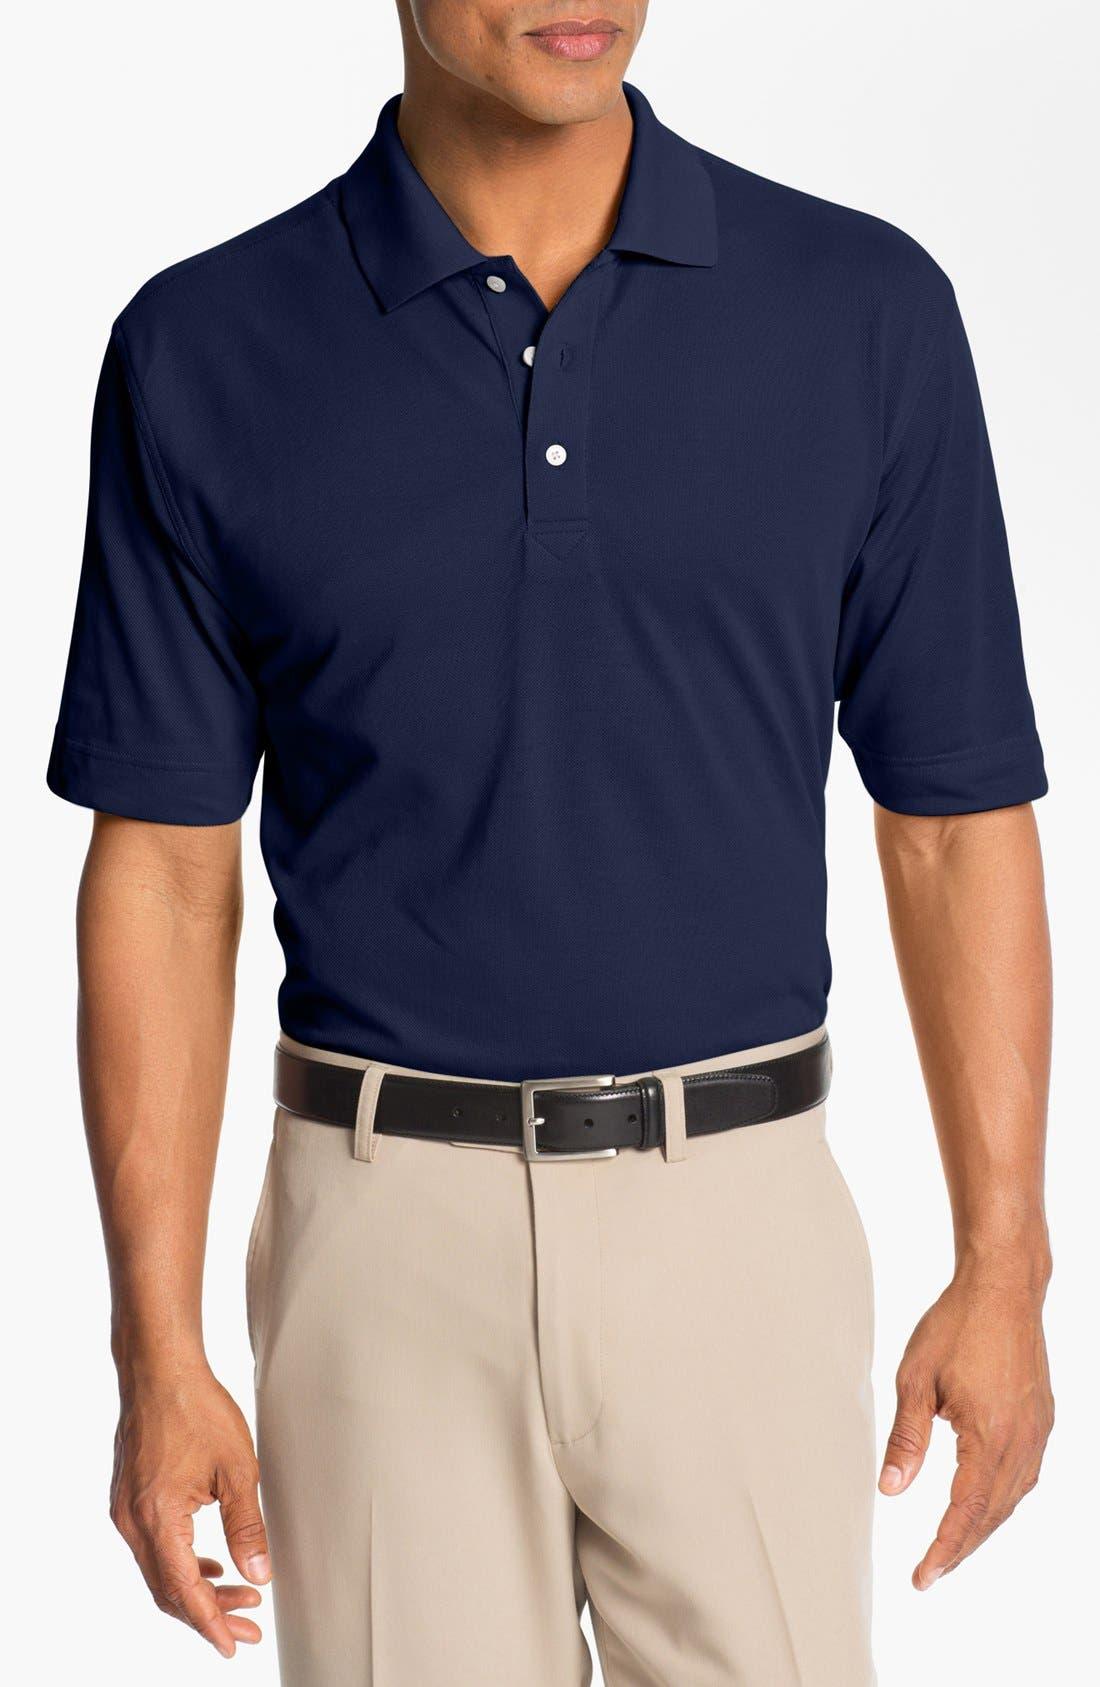 Championship DryTec Golf Polo,                         Main,                         color, NAVY